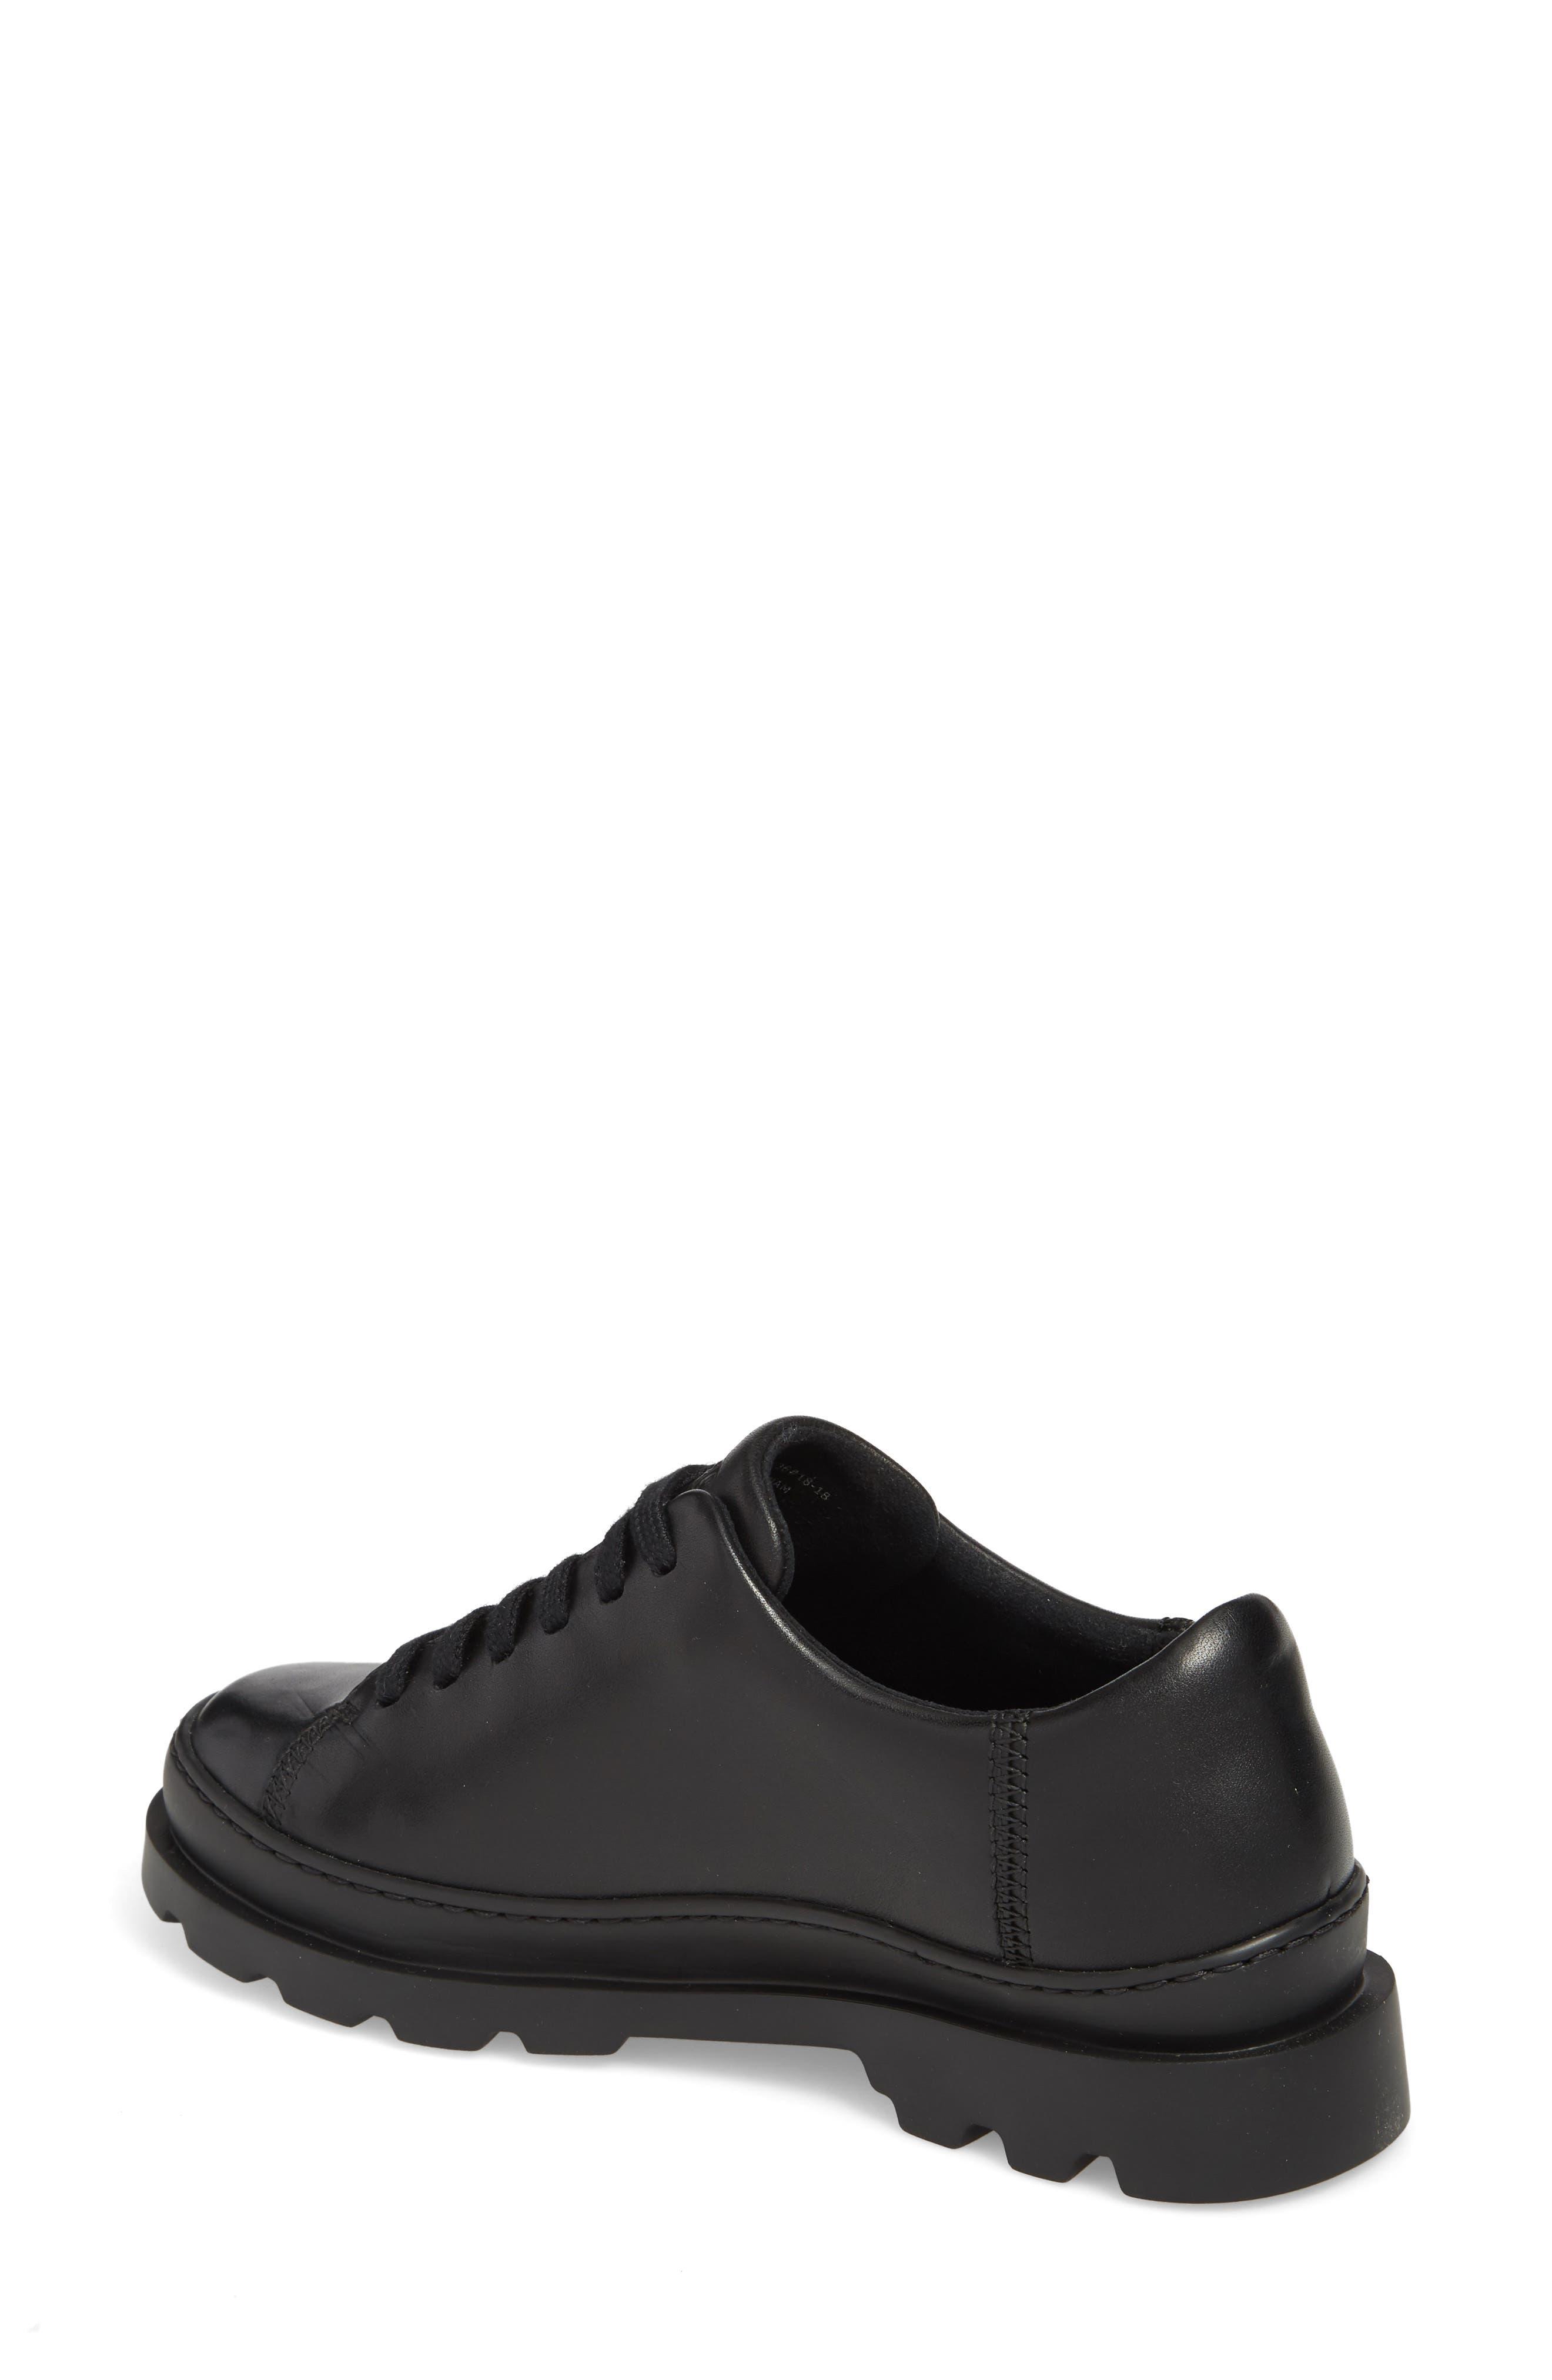 Brutus Sneaker,                             Alternate thumbnail 2, color,                             BLACK LEATHER